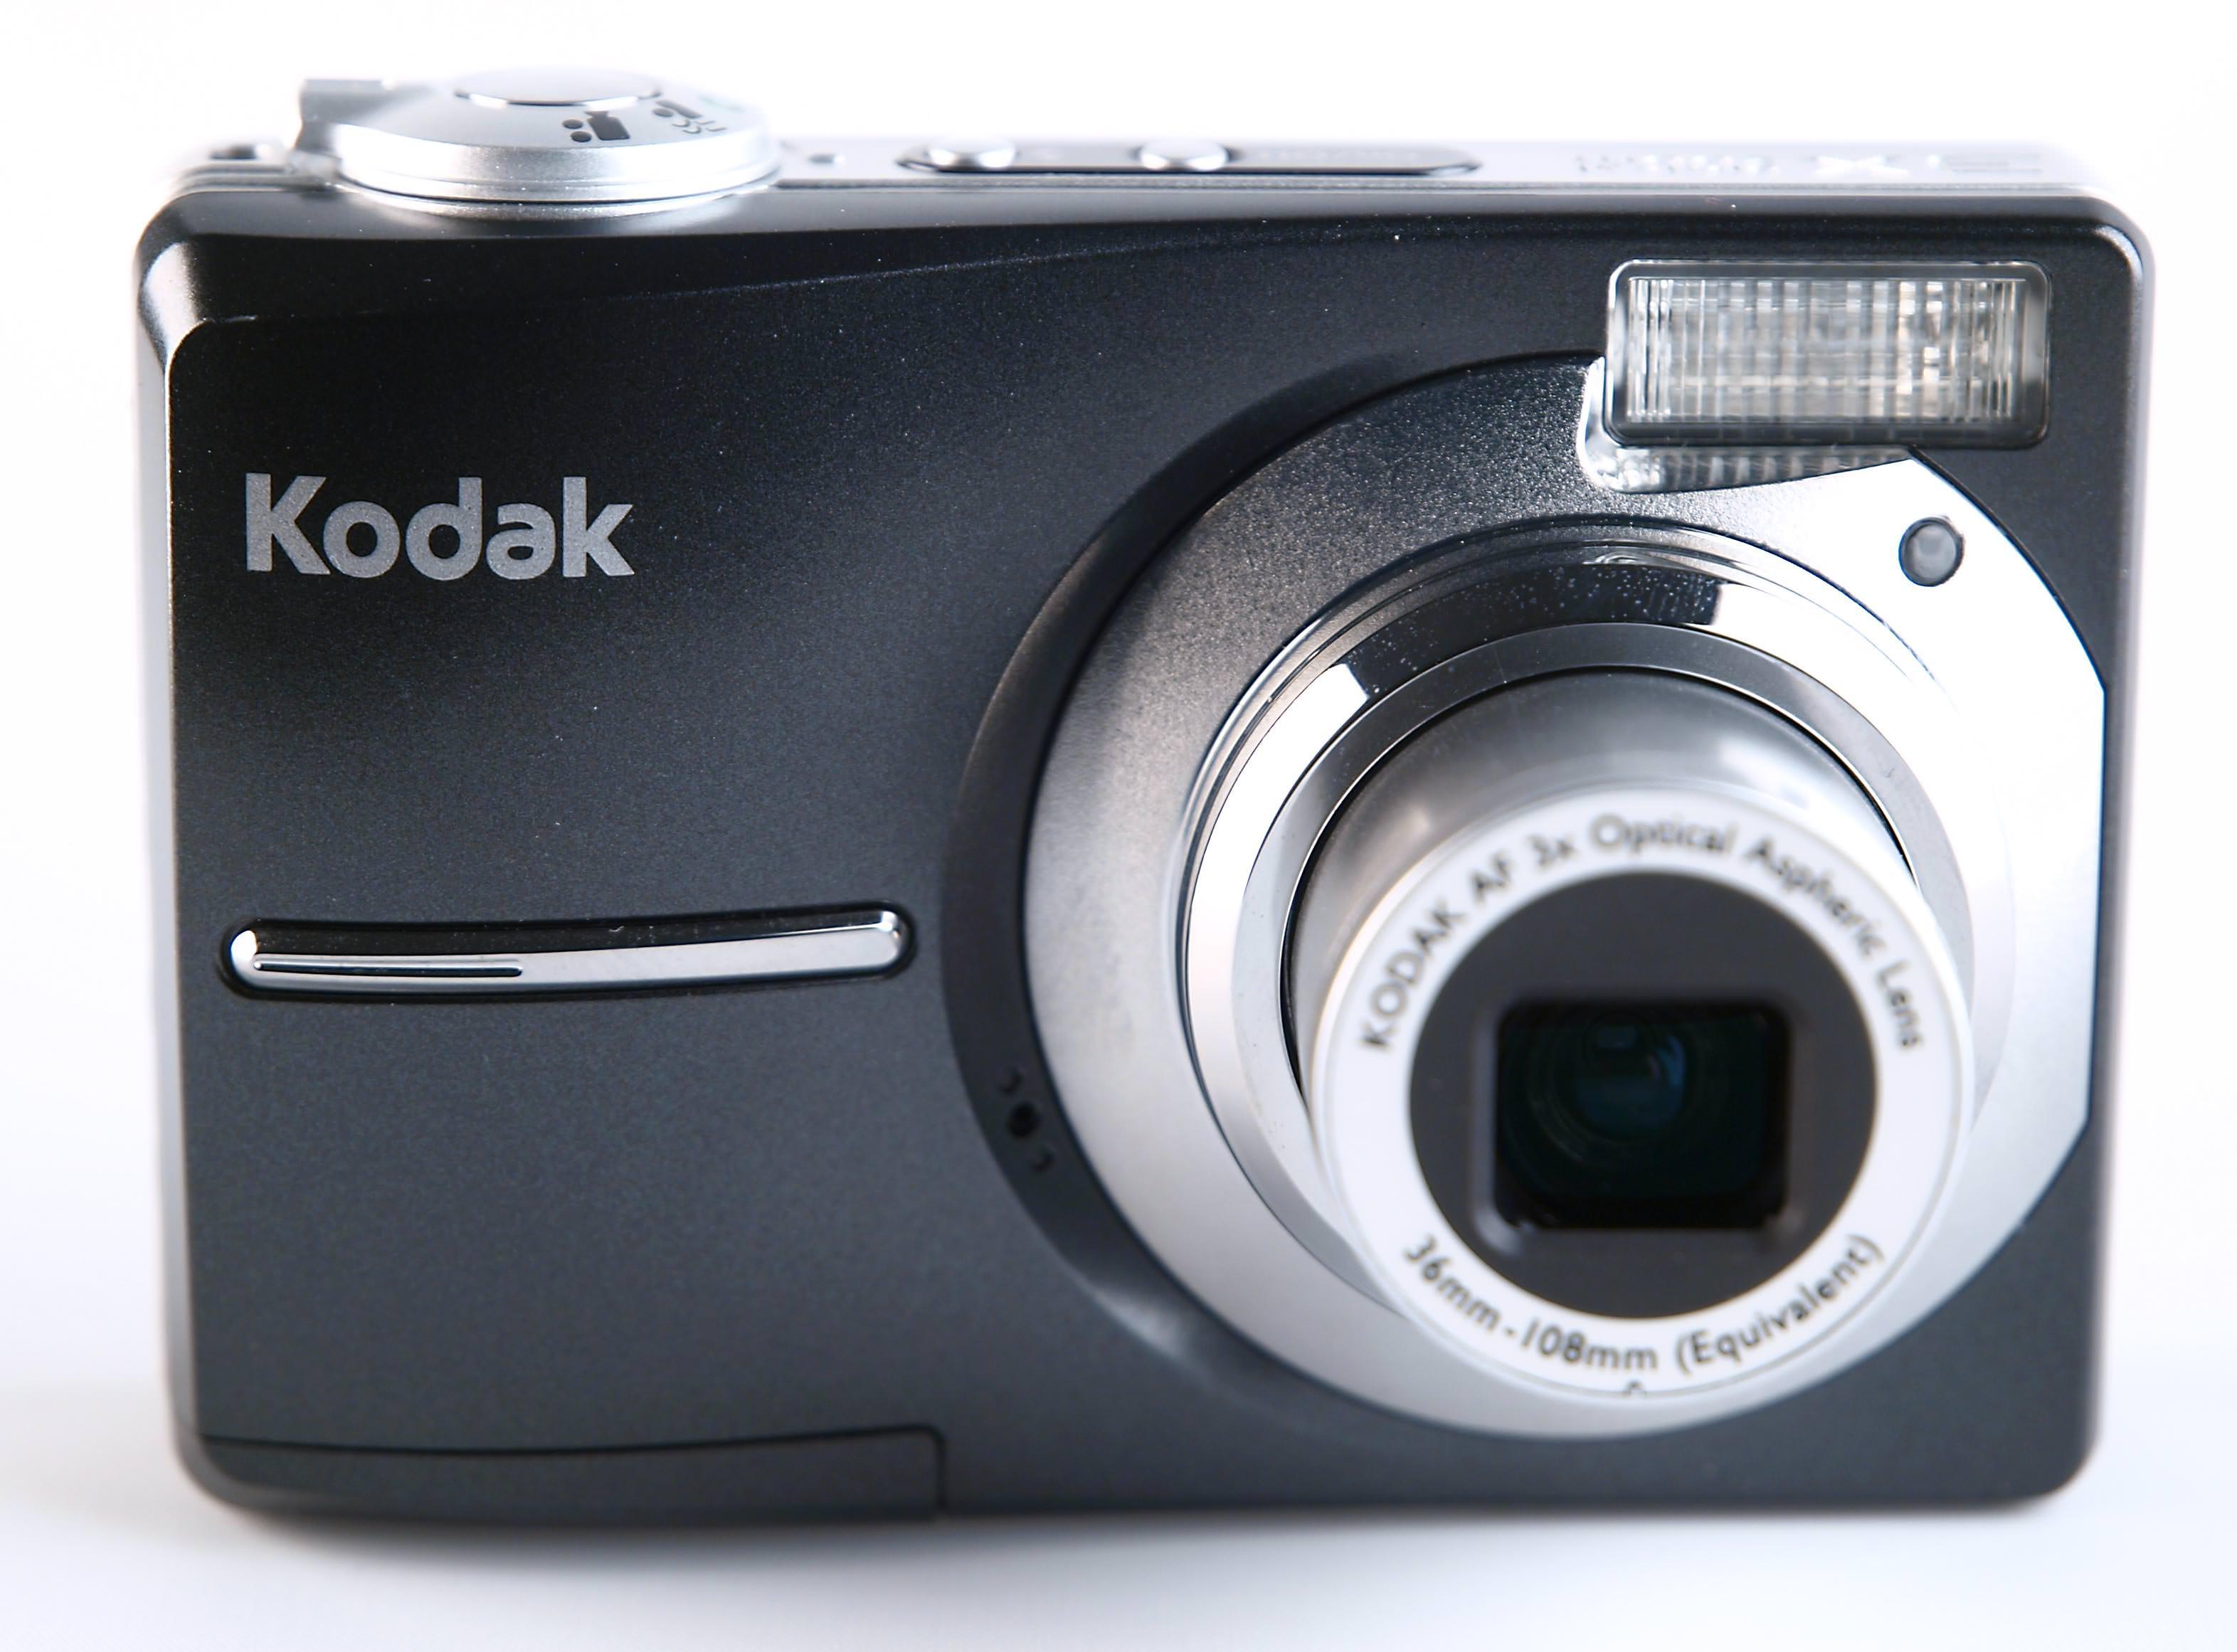 Kodak Easyshare C913 Digital Camera Review